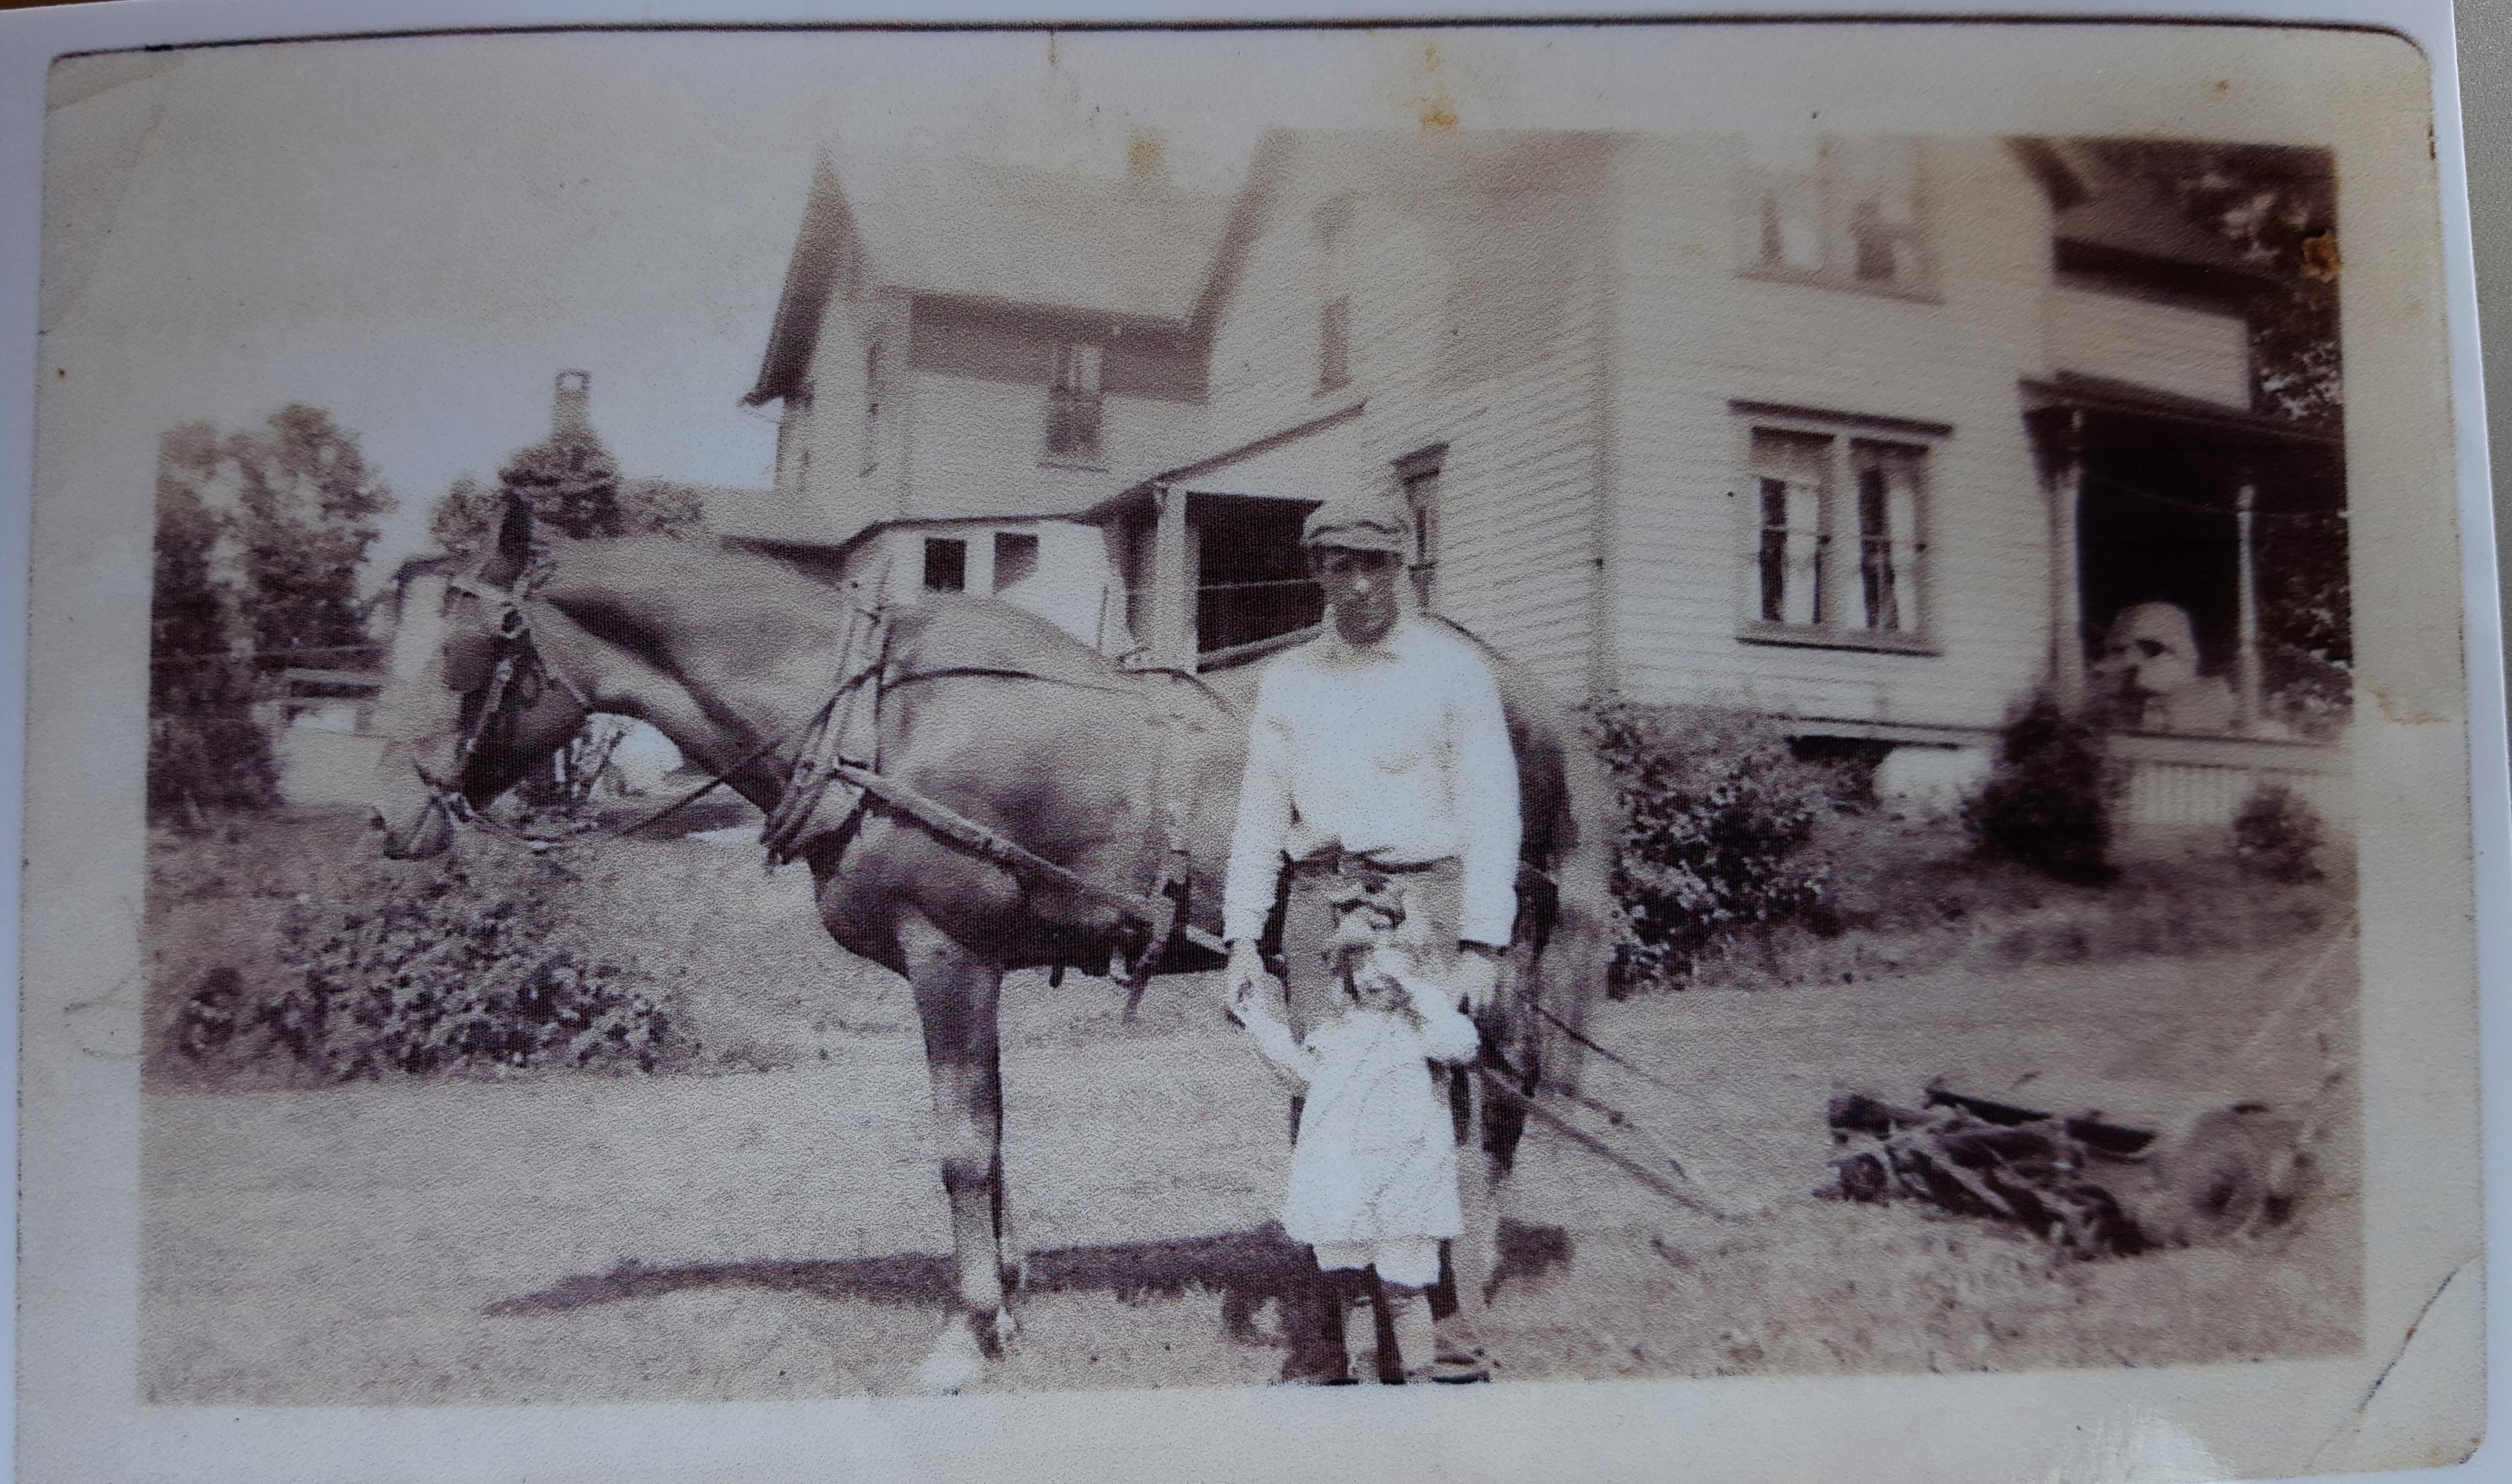 Horse-powered mower (circa 1920)